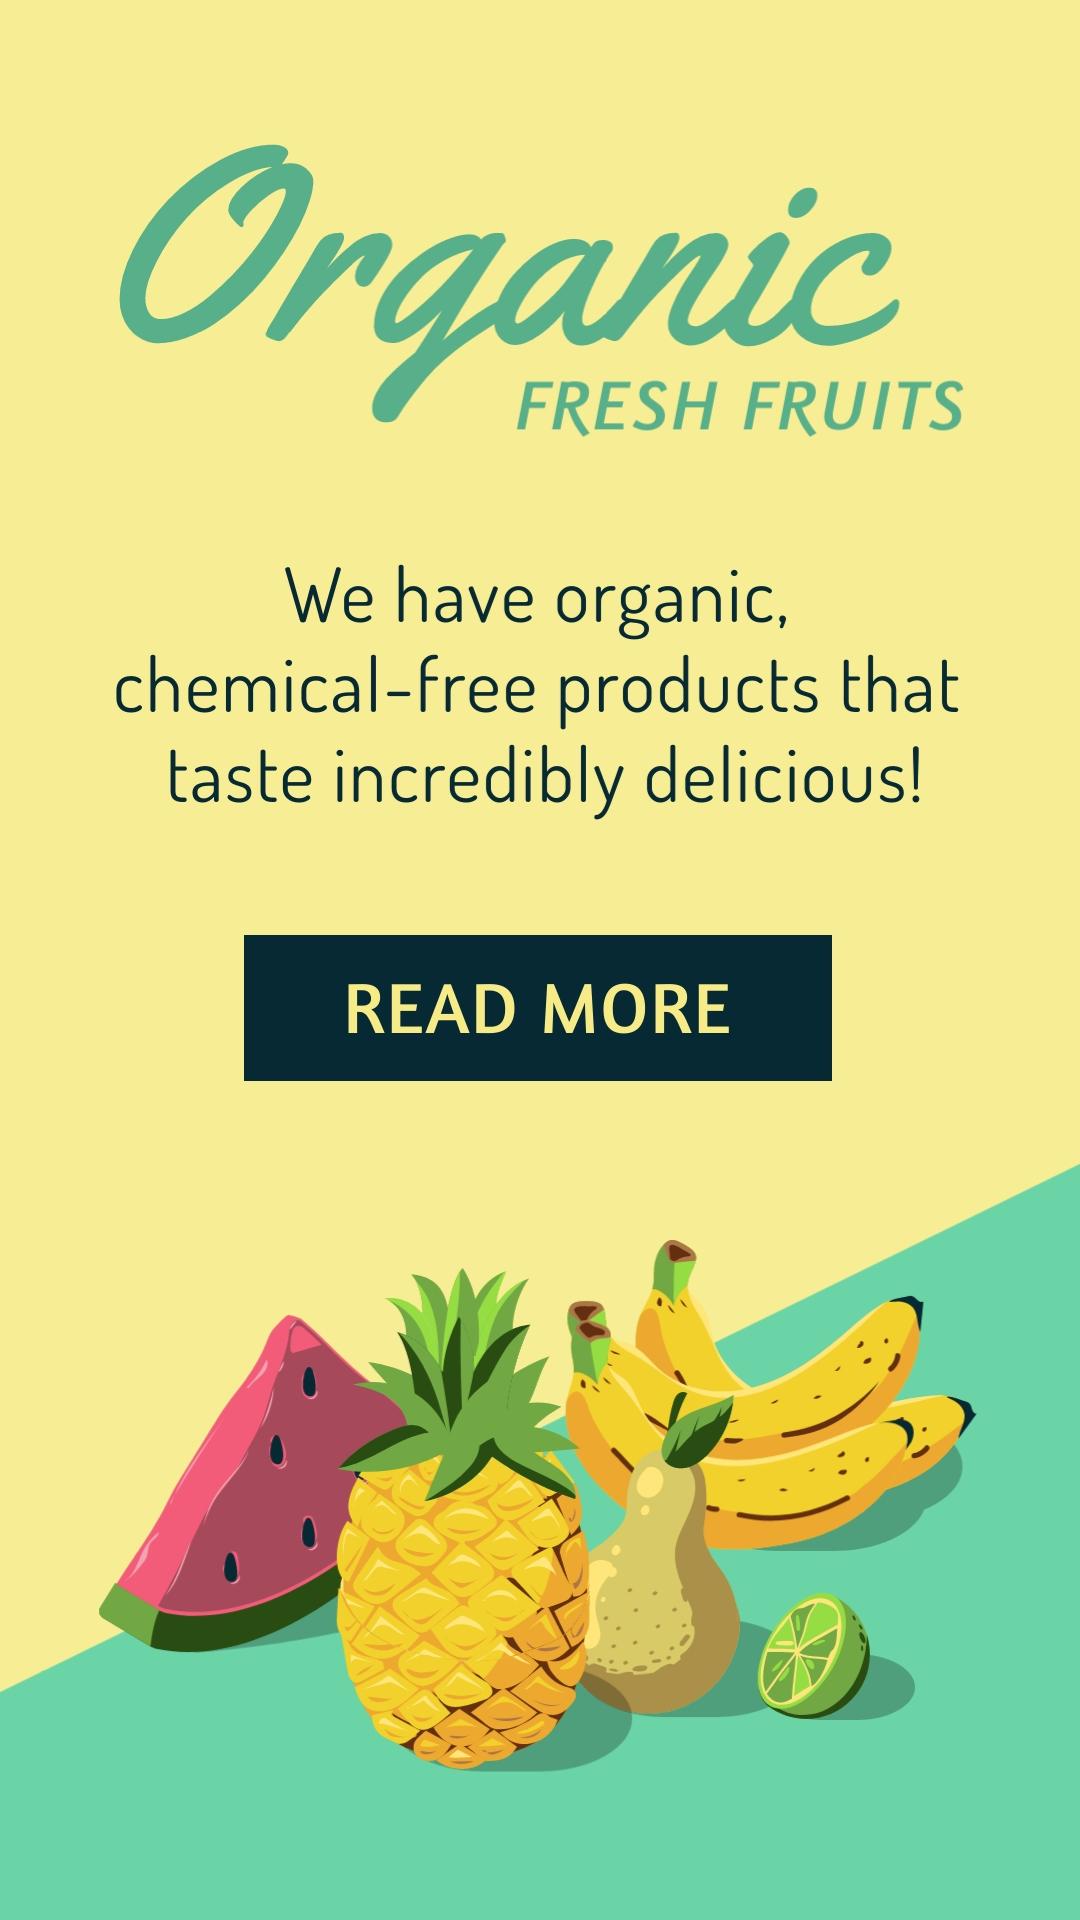 Organic Fresh Fruits Vertical Template